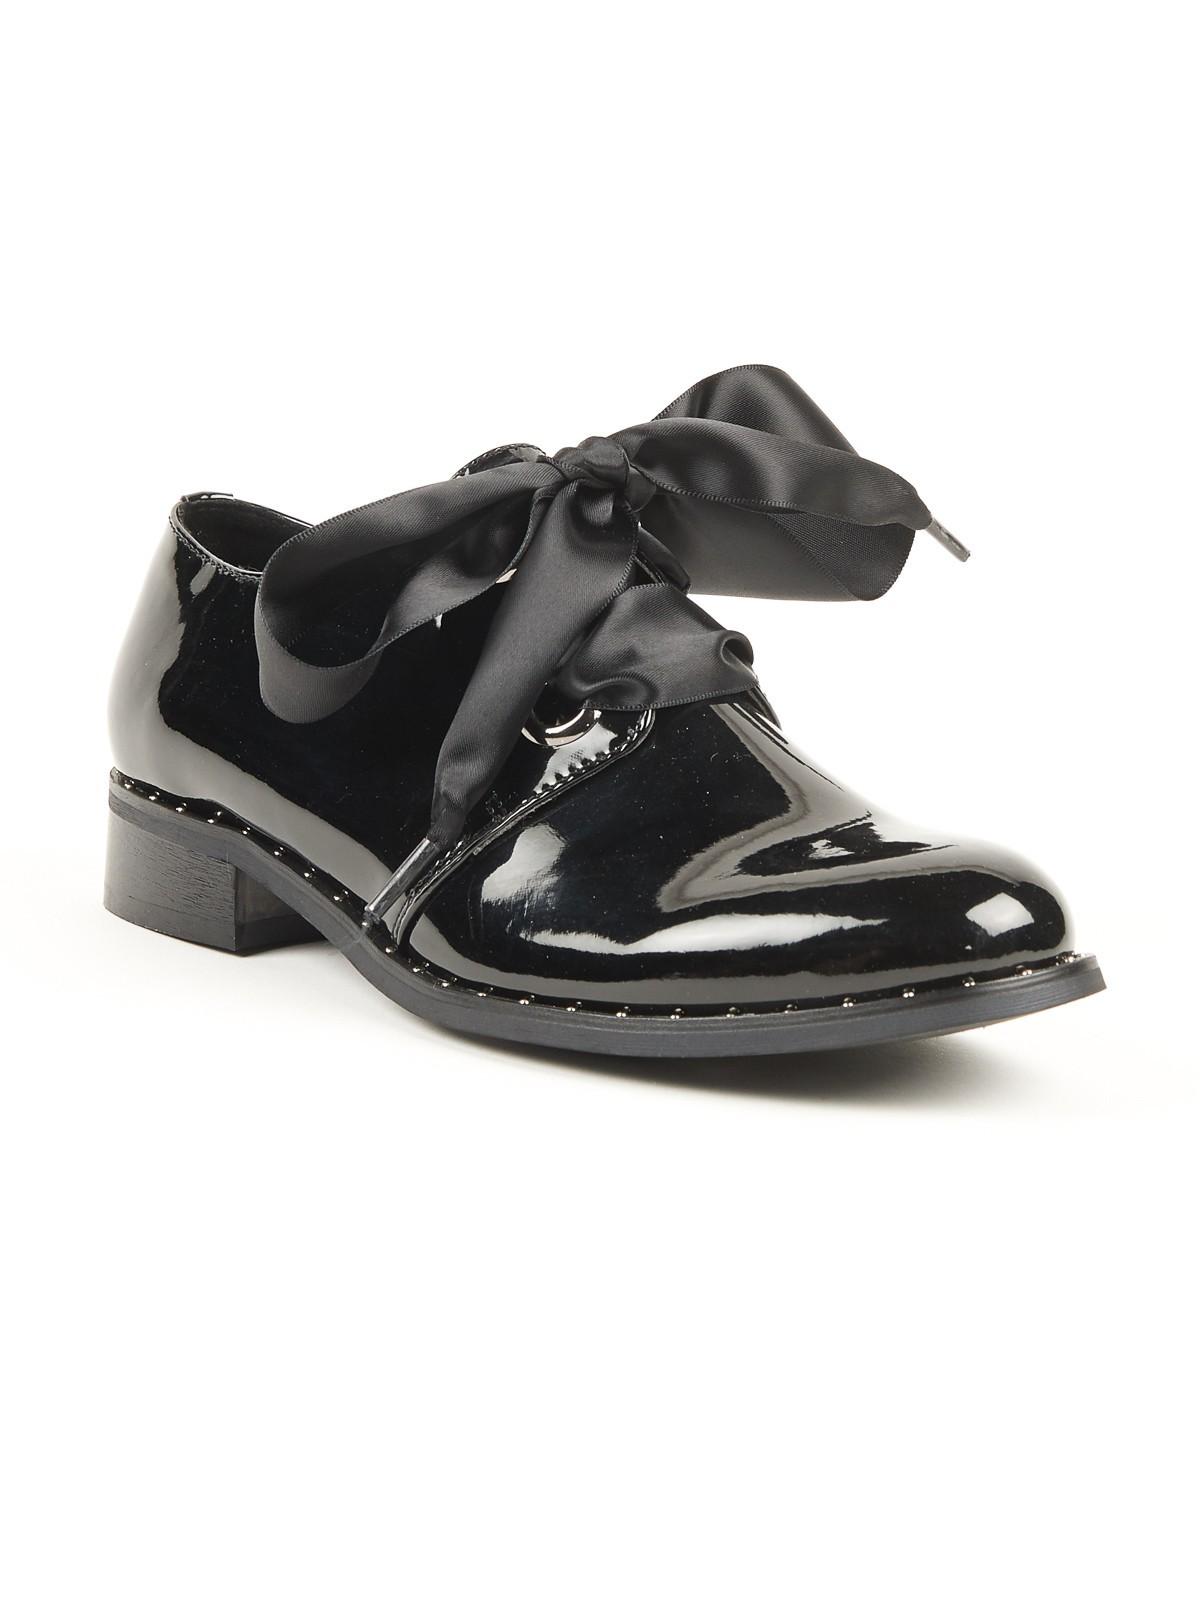 22a5a6f592a9c4 Chaussure femme à lacet ruban (36-41) - DistriCenter